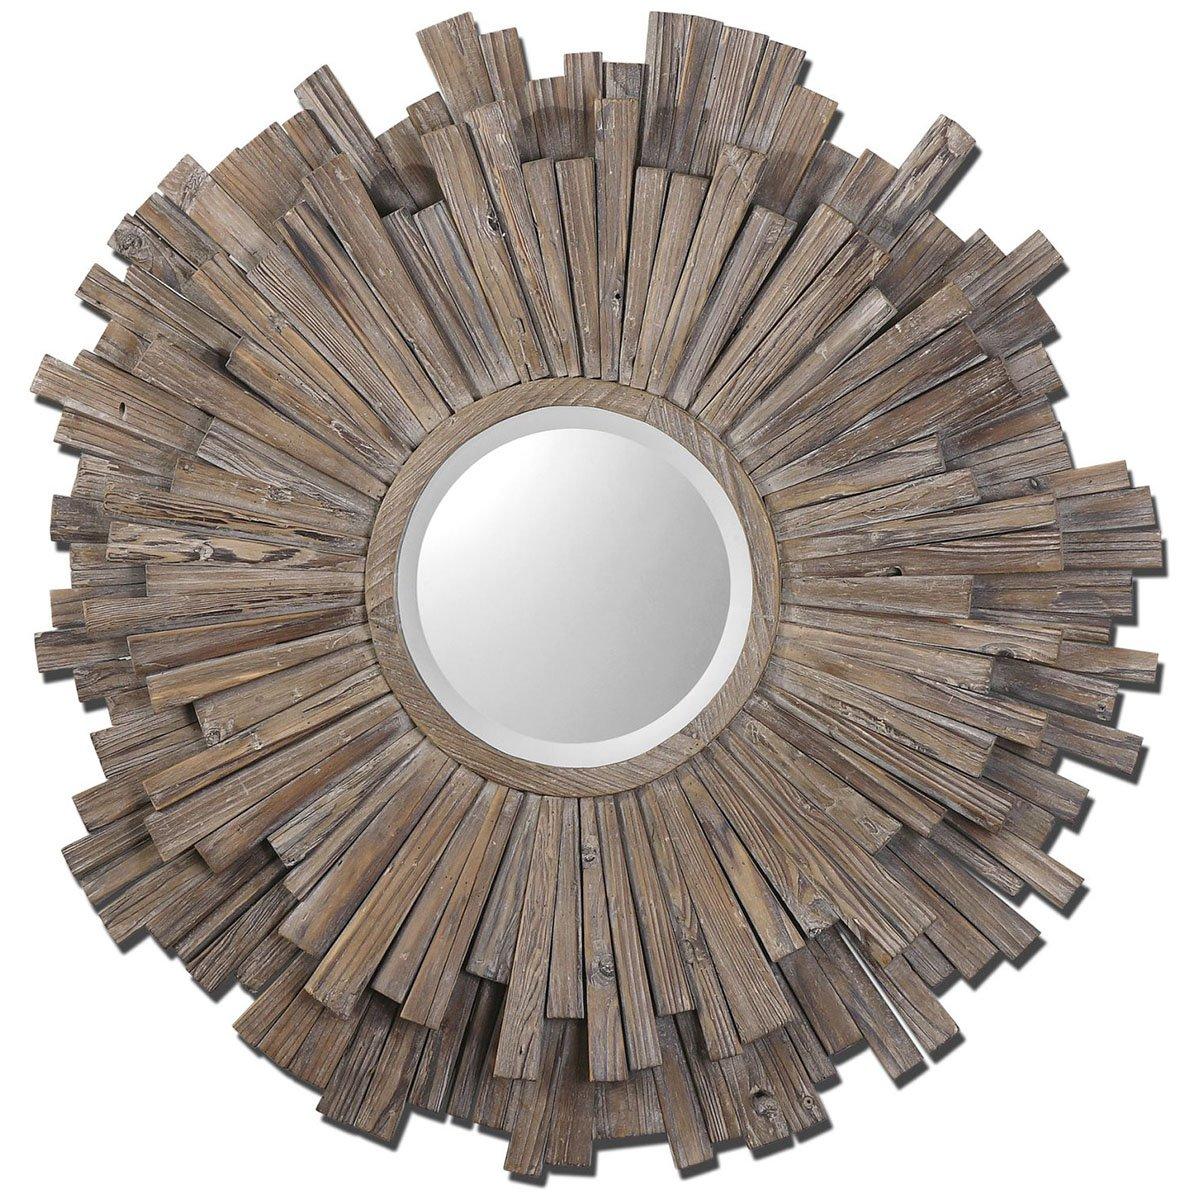 This italian circular wooden wall mirror is no longer available - This Italian Circular Wooden Wall Mirror Is No Longer Available 22